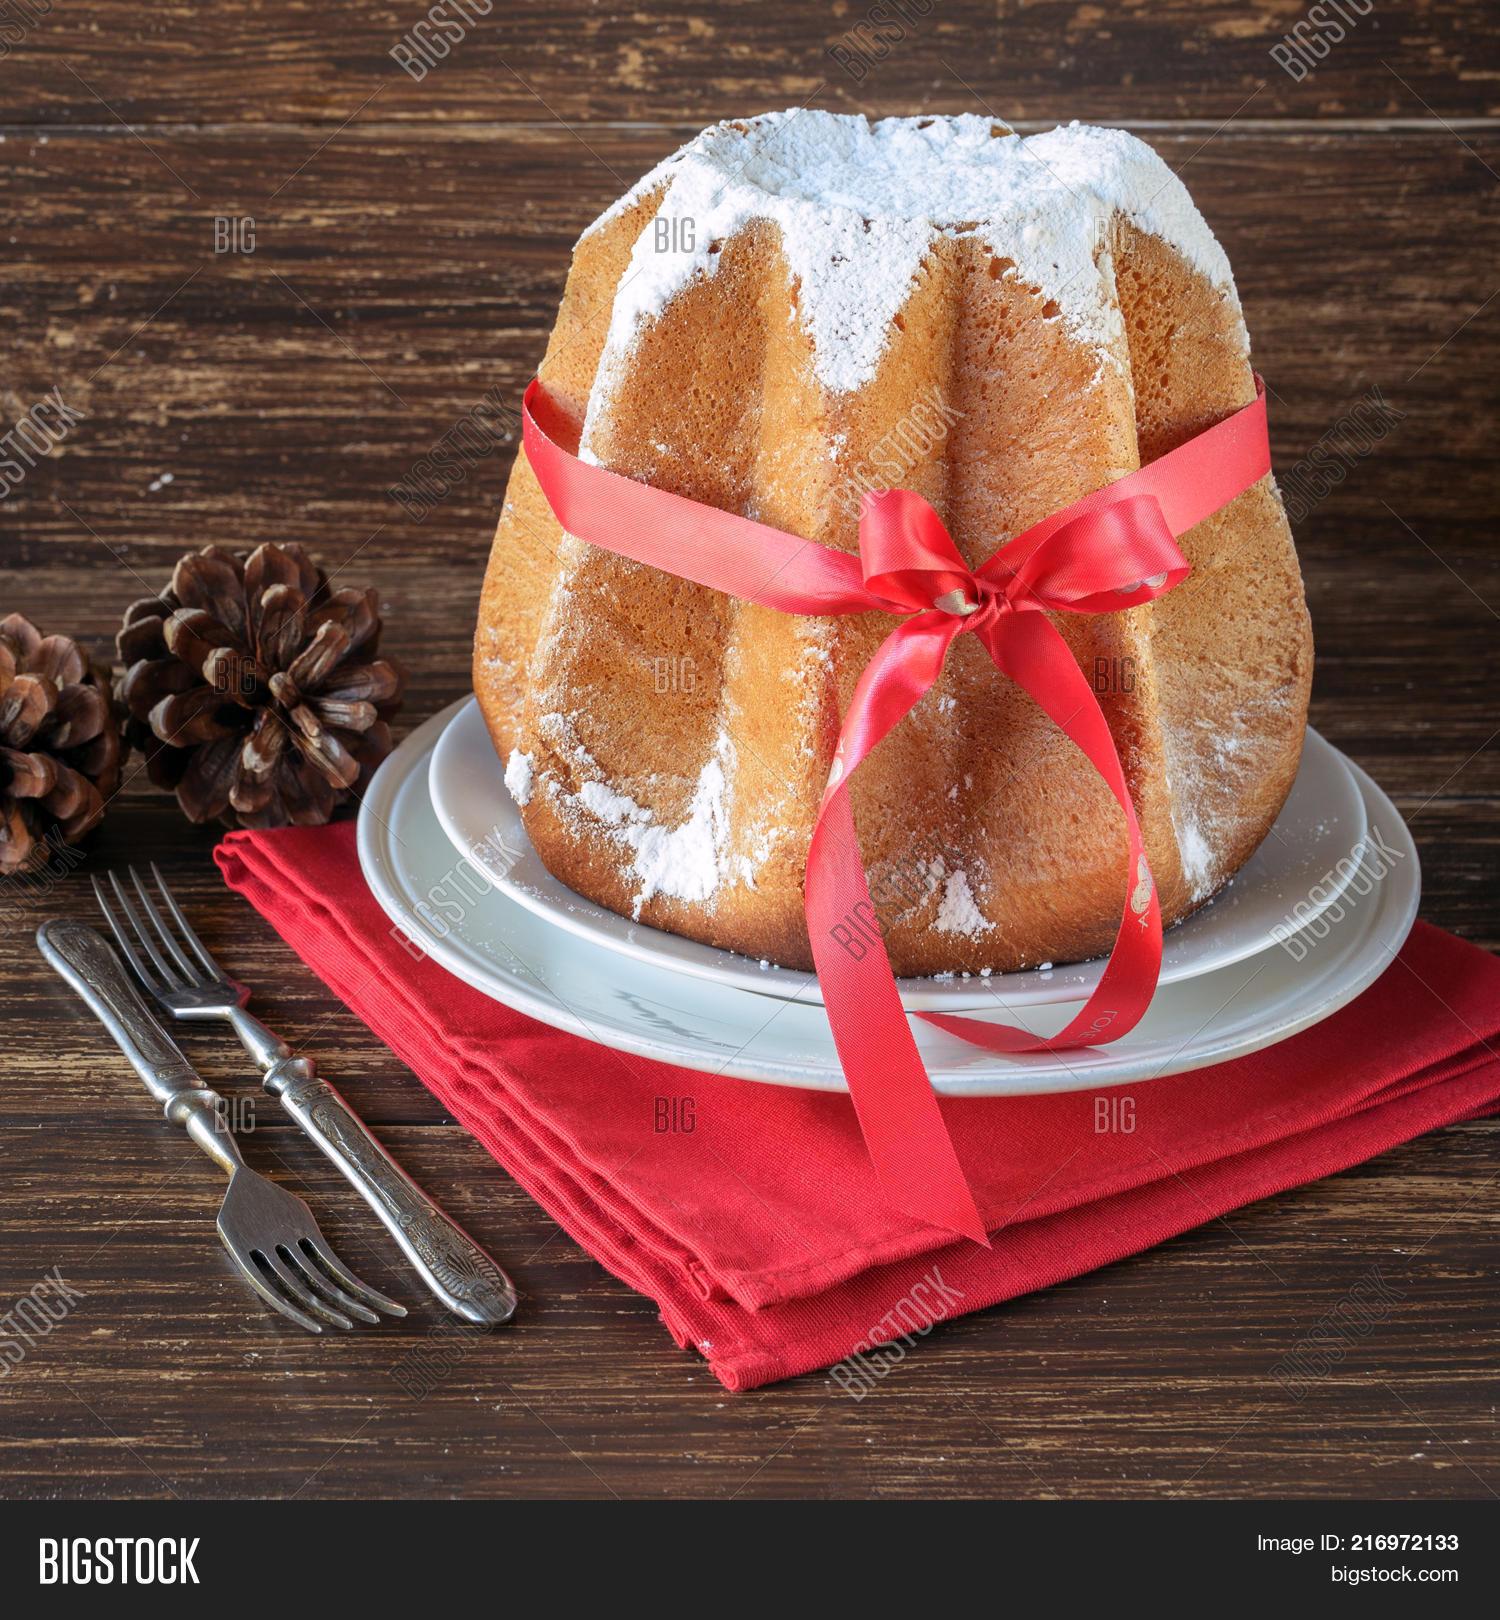 Italian Christmas Cake.Italian Christmas Cake Image Photo Free Trial Bigstock